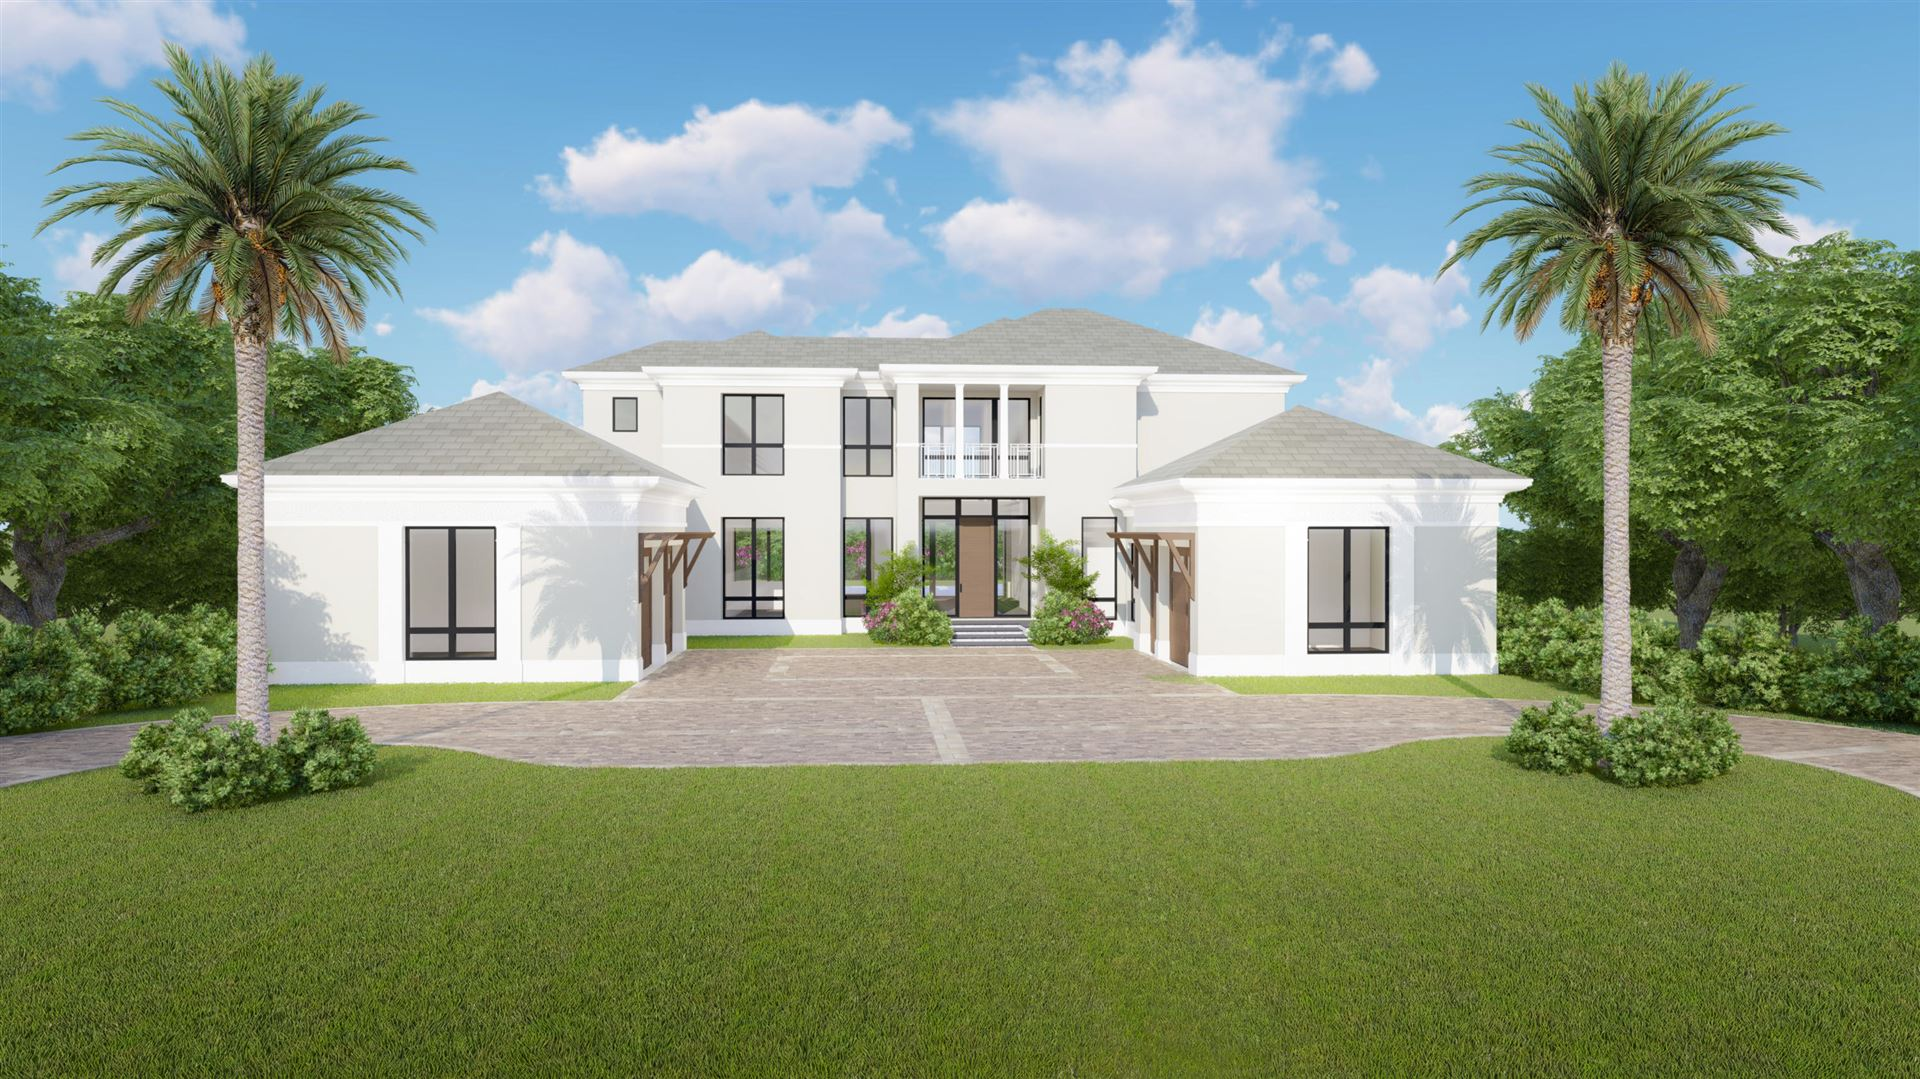 Photo of 3220 Monet Drive W, Palm Beach Gardens, FL 33410 (MLS # RX-10623567)